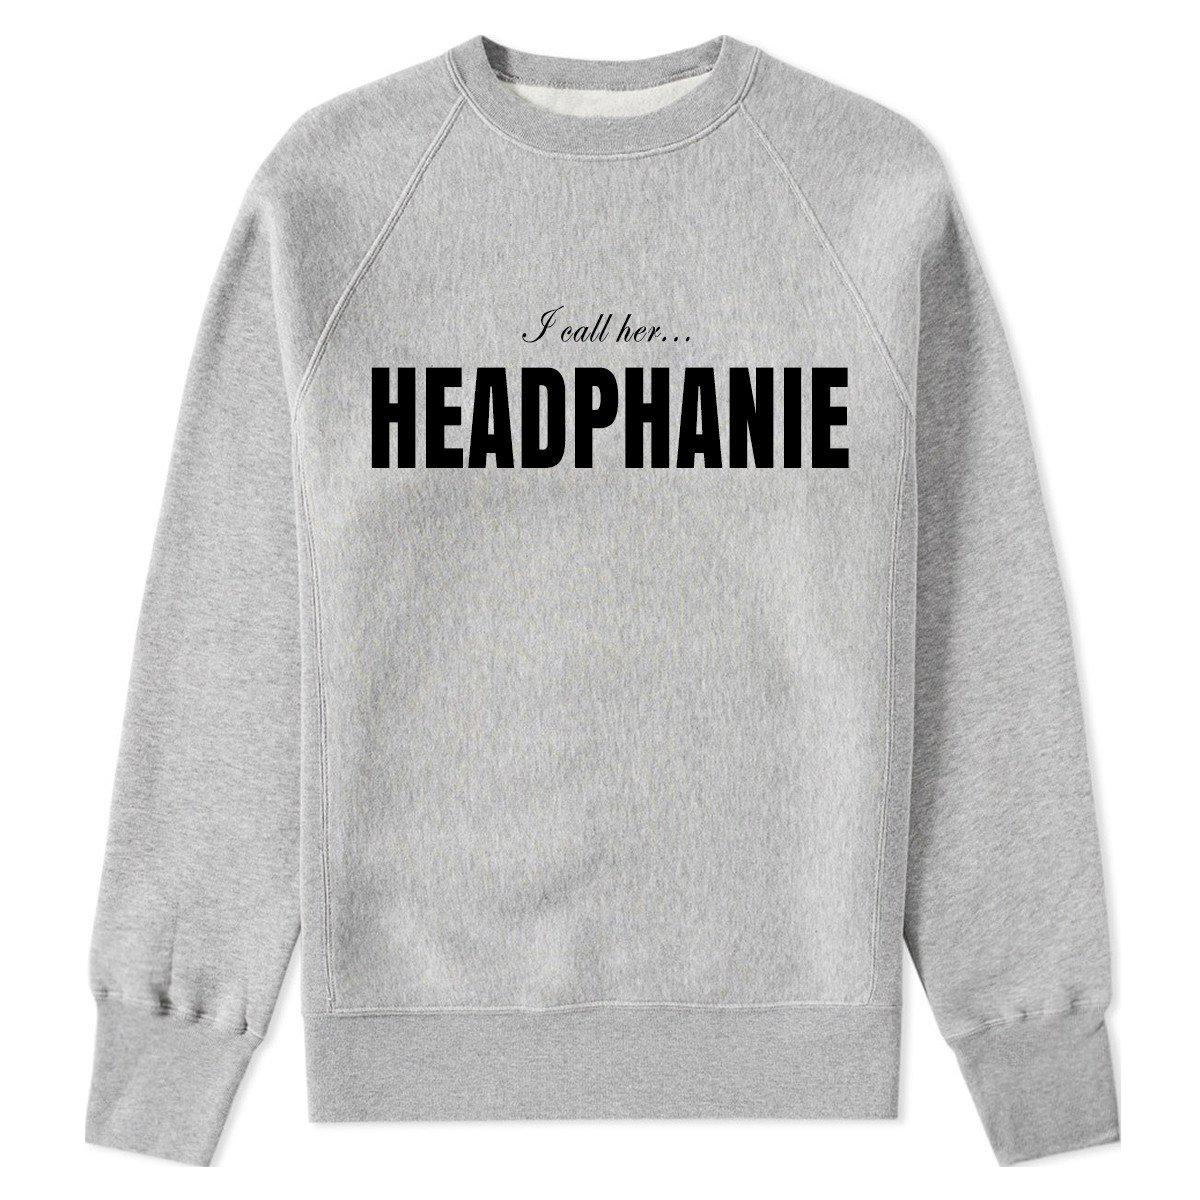 Headphanie Crewneck Sweatshirt